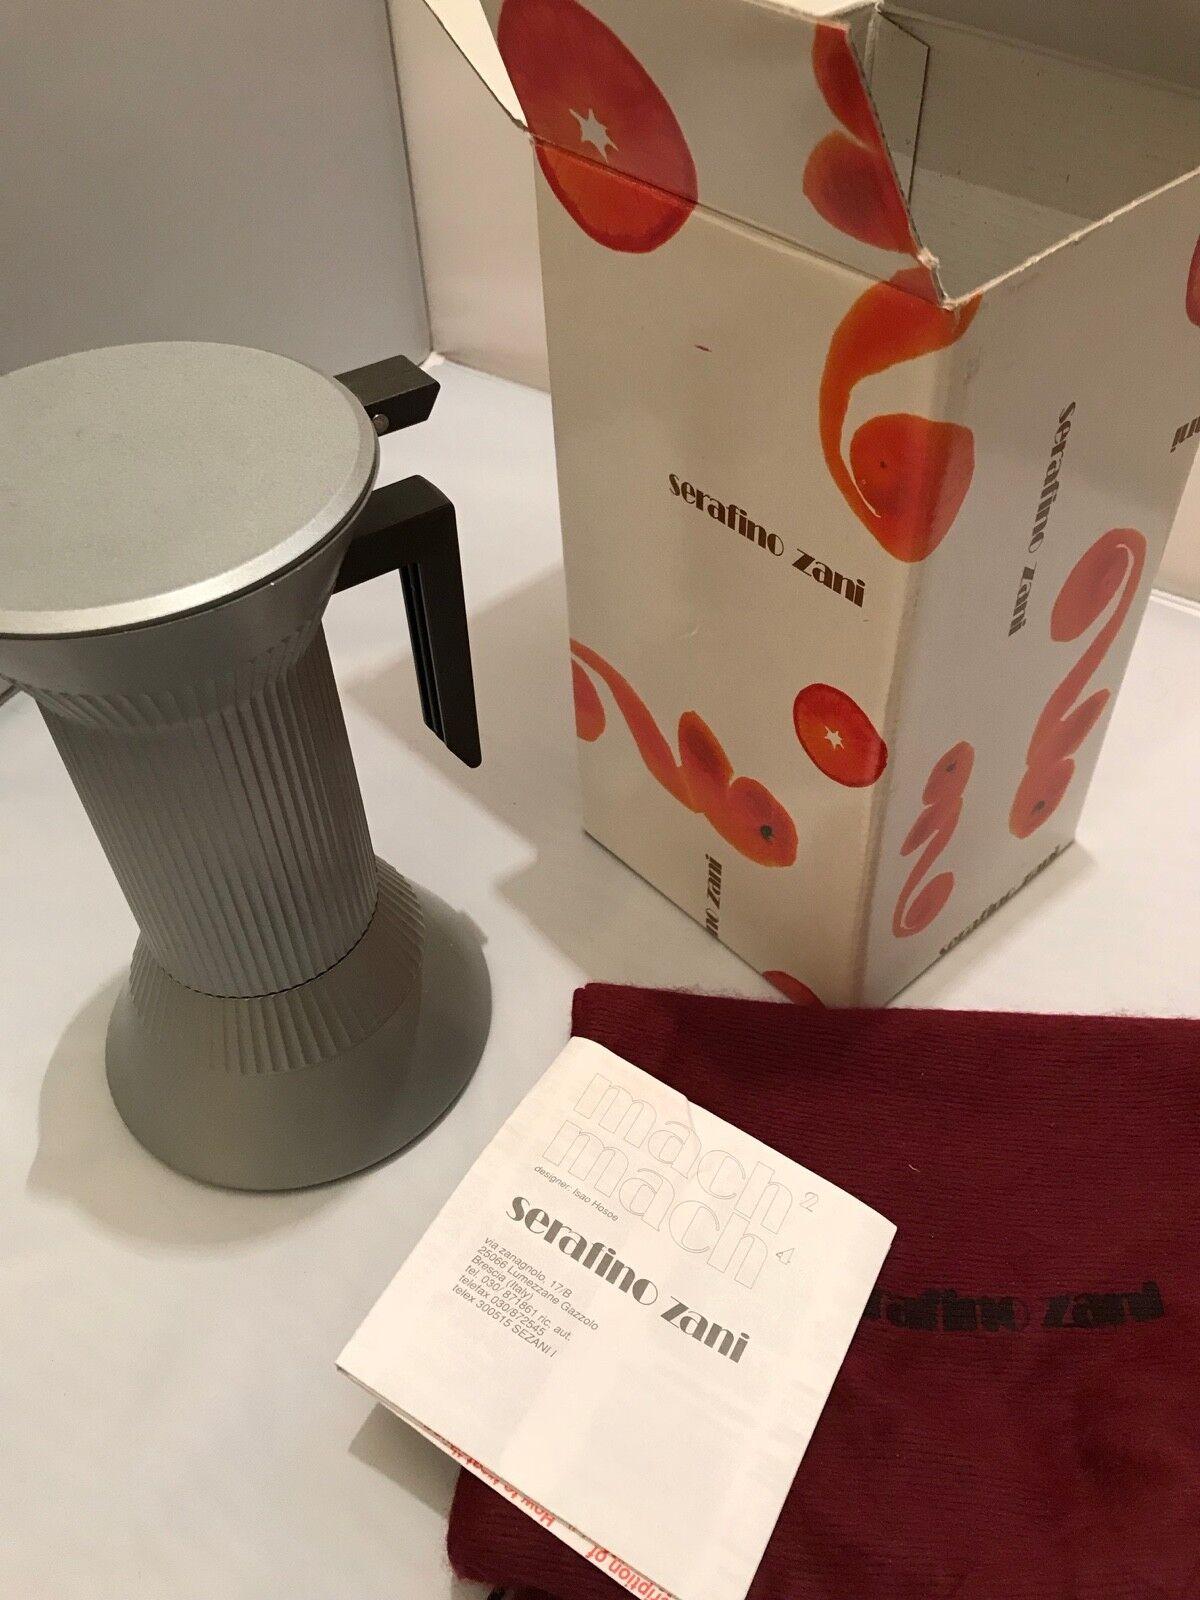 Nouveau-Serafino Zani Mach coffee pot par Isao hosee Sam Ribet-Mach 4